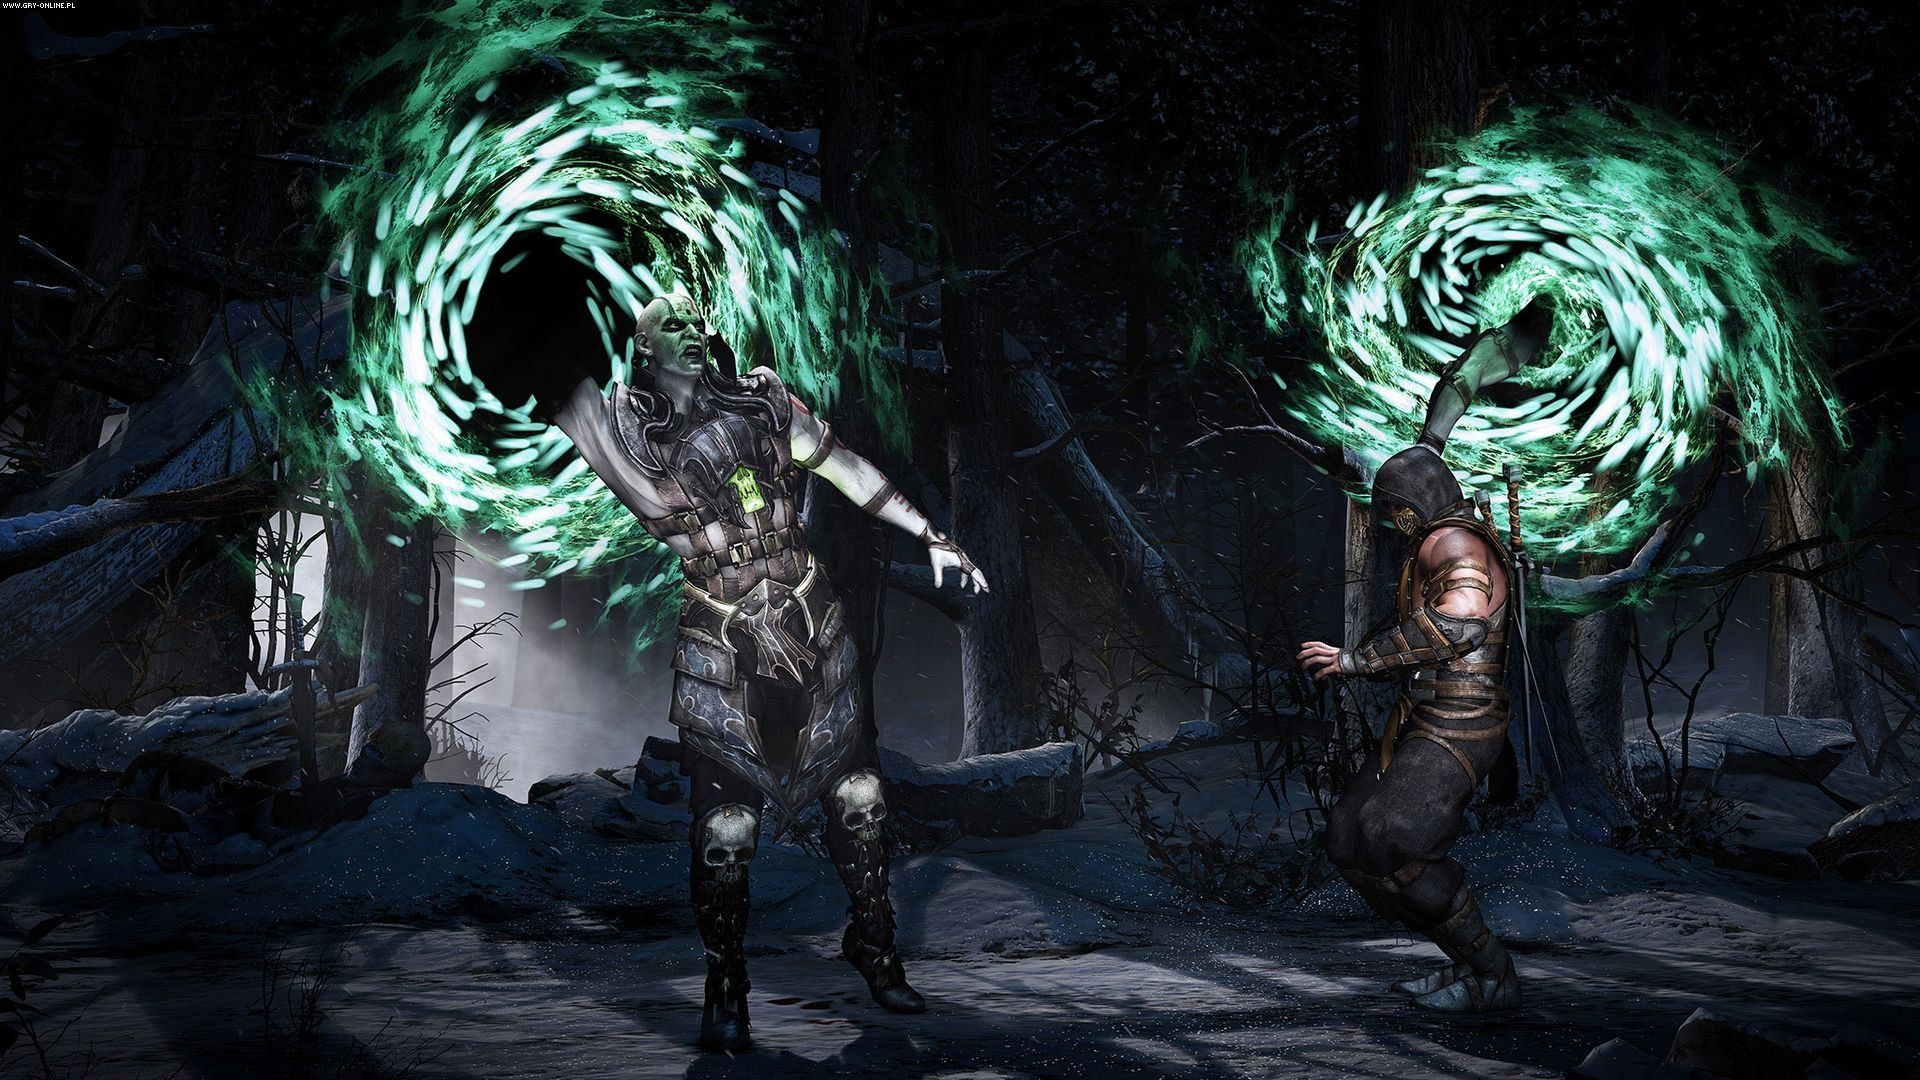 Mortal Kombat X image #2